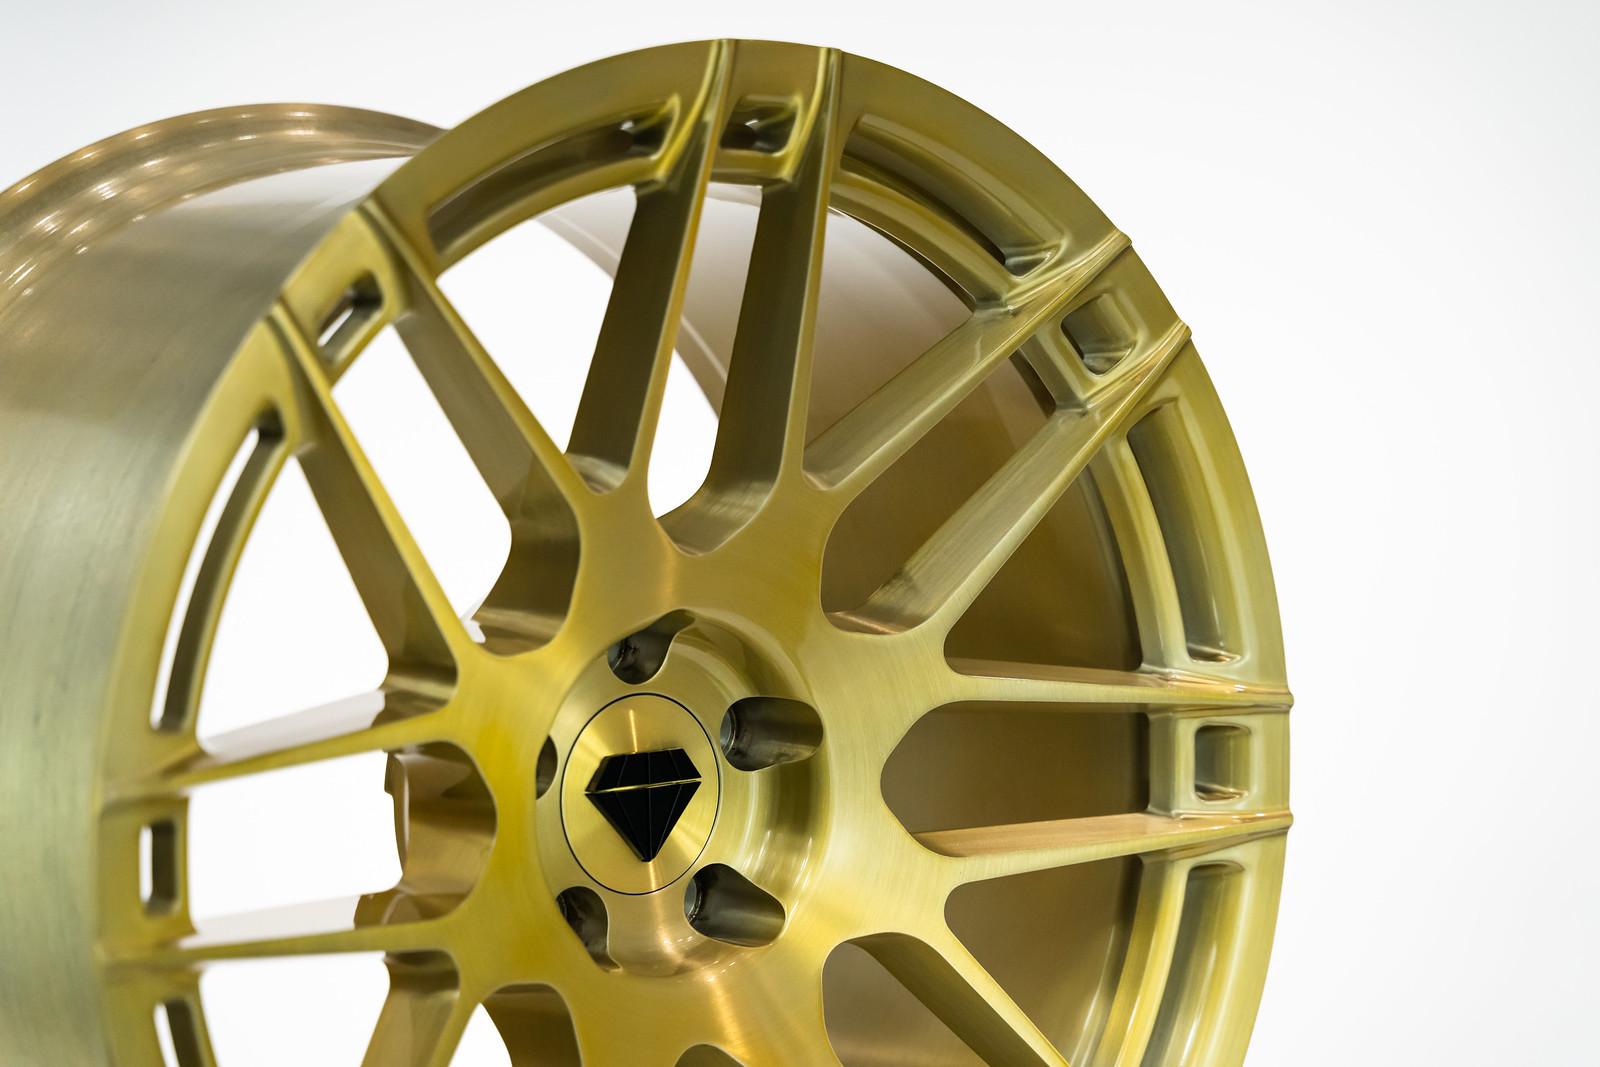 BDF12_Custom_Finish_Transparent_Brassy_Clear_Gold_3